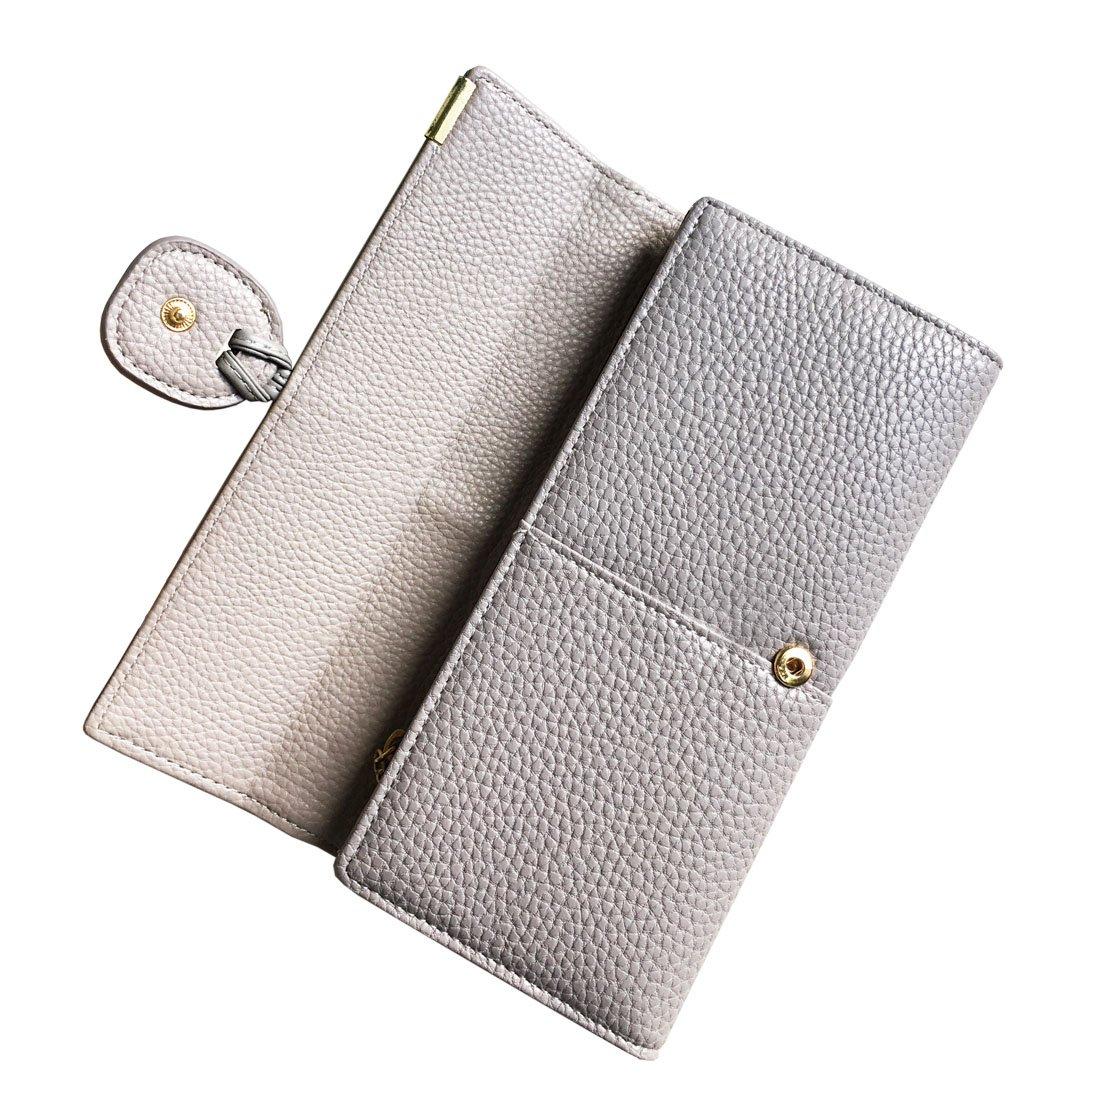 Rfid Blocking Leather wallet for women Girls,ladies long purse Large Capacity(Grey) by YOTOO (Image #5)